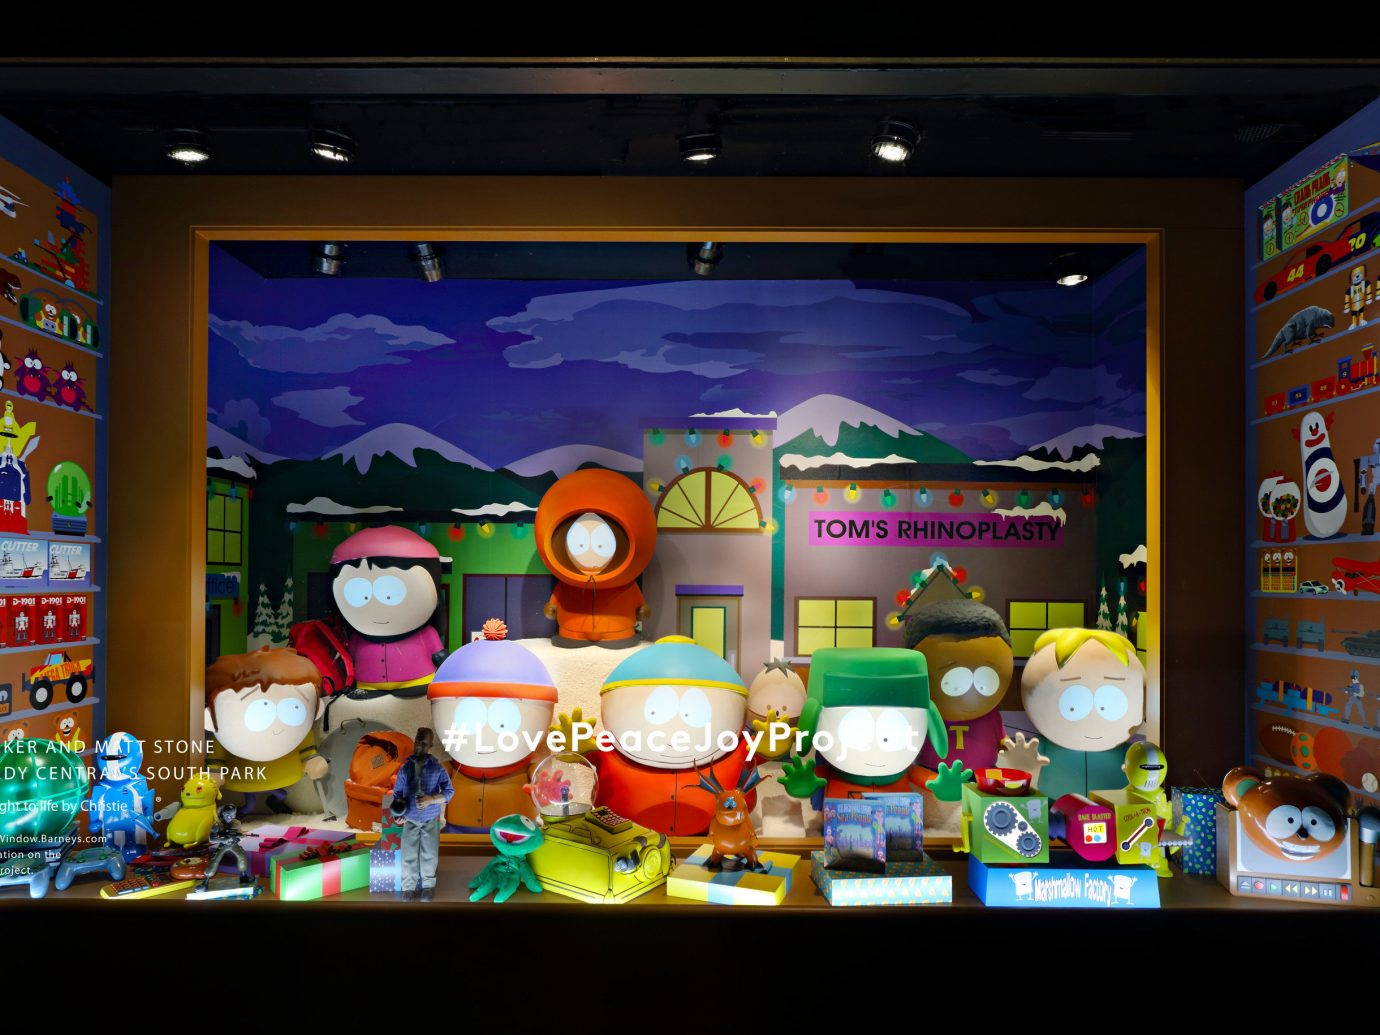 Trip Ideas machine slot machine glass window screenshot games display